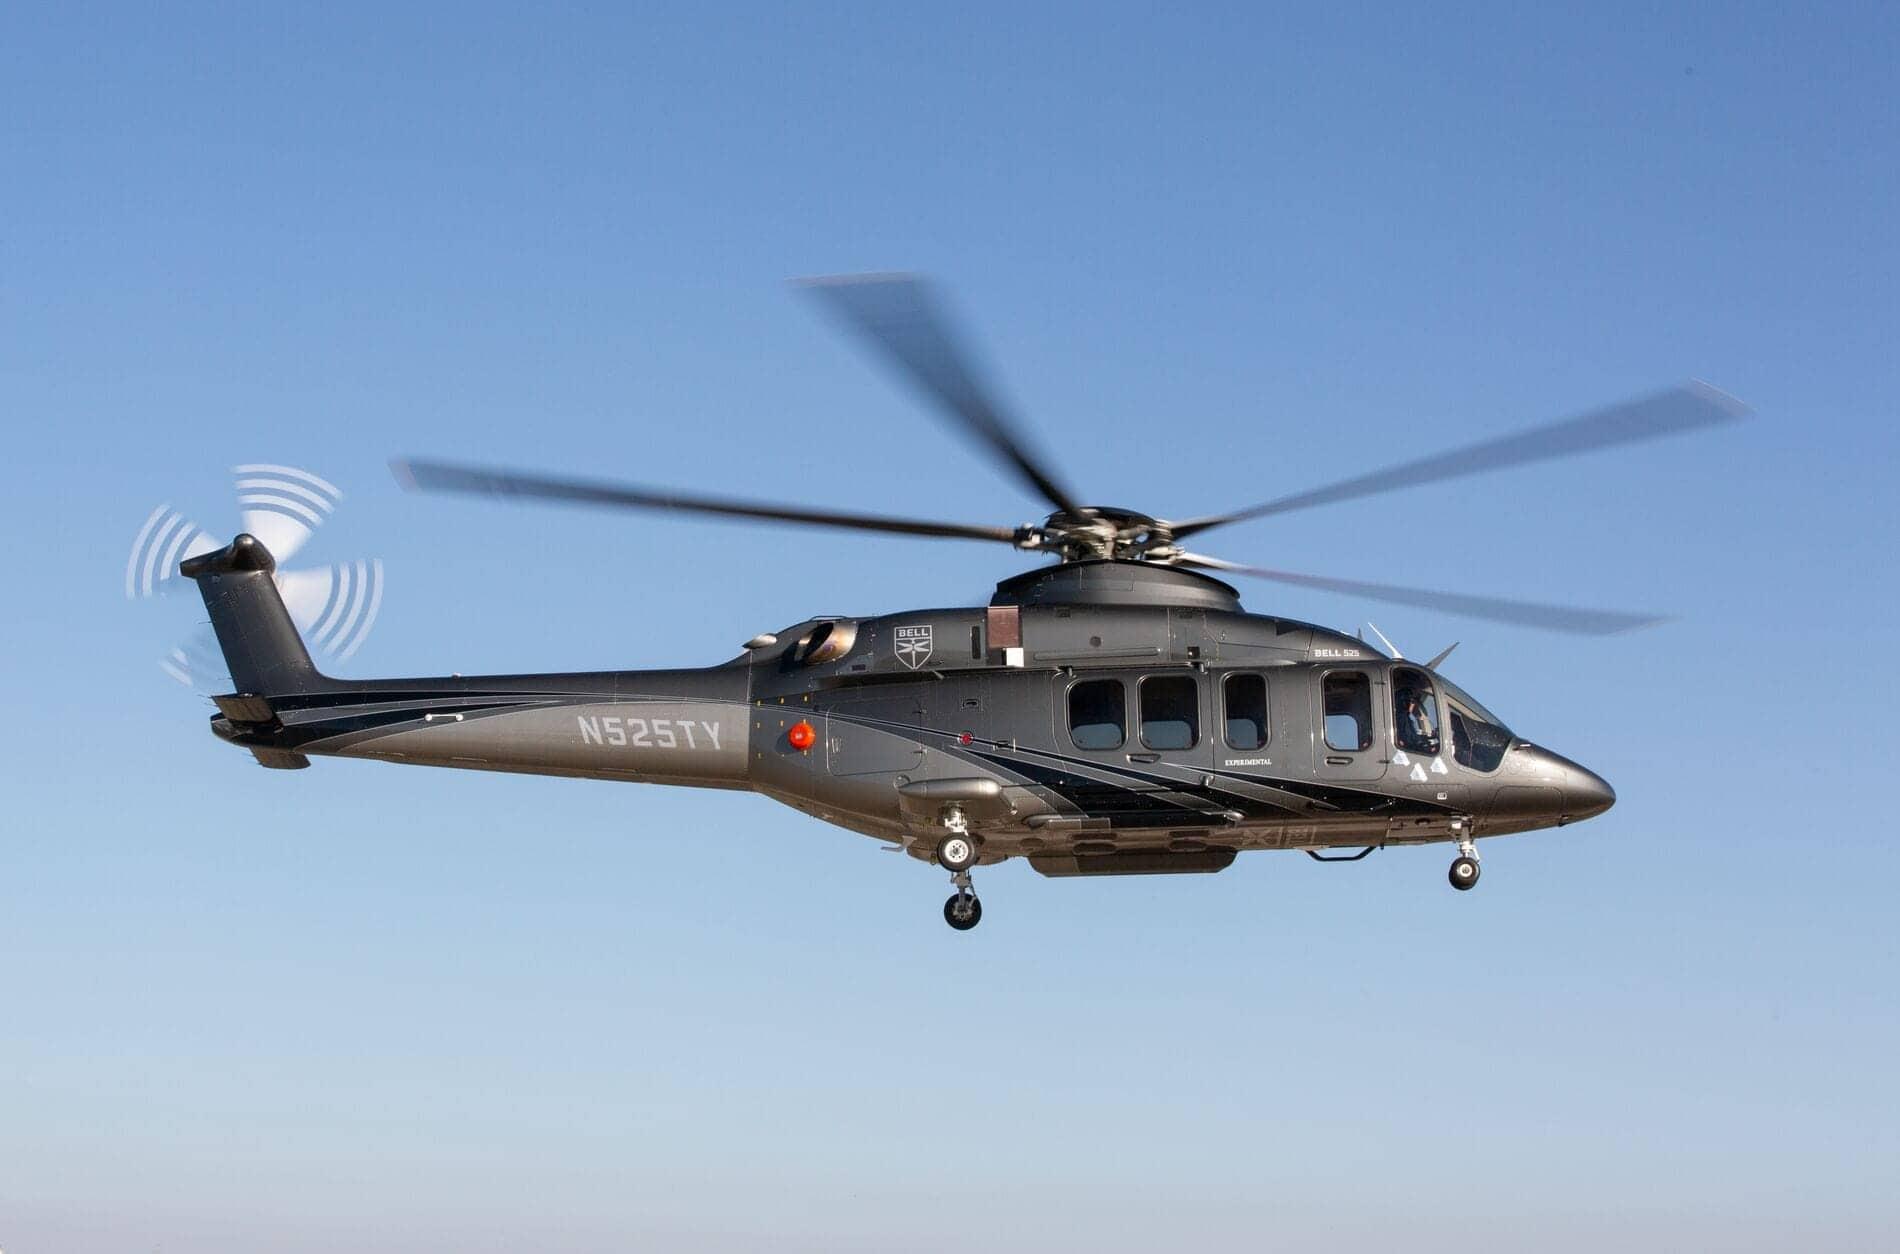 Bell 525 en vol et vue de profil